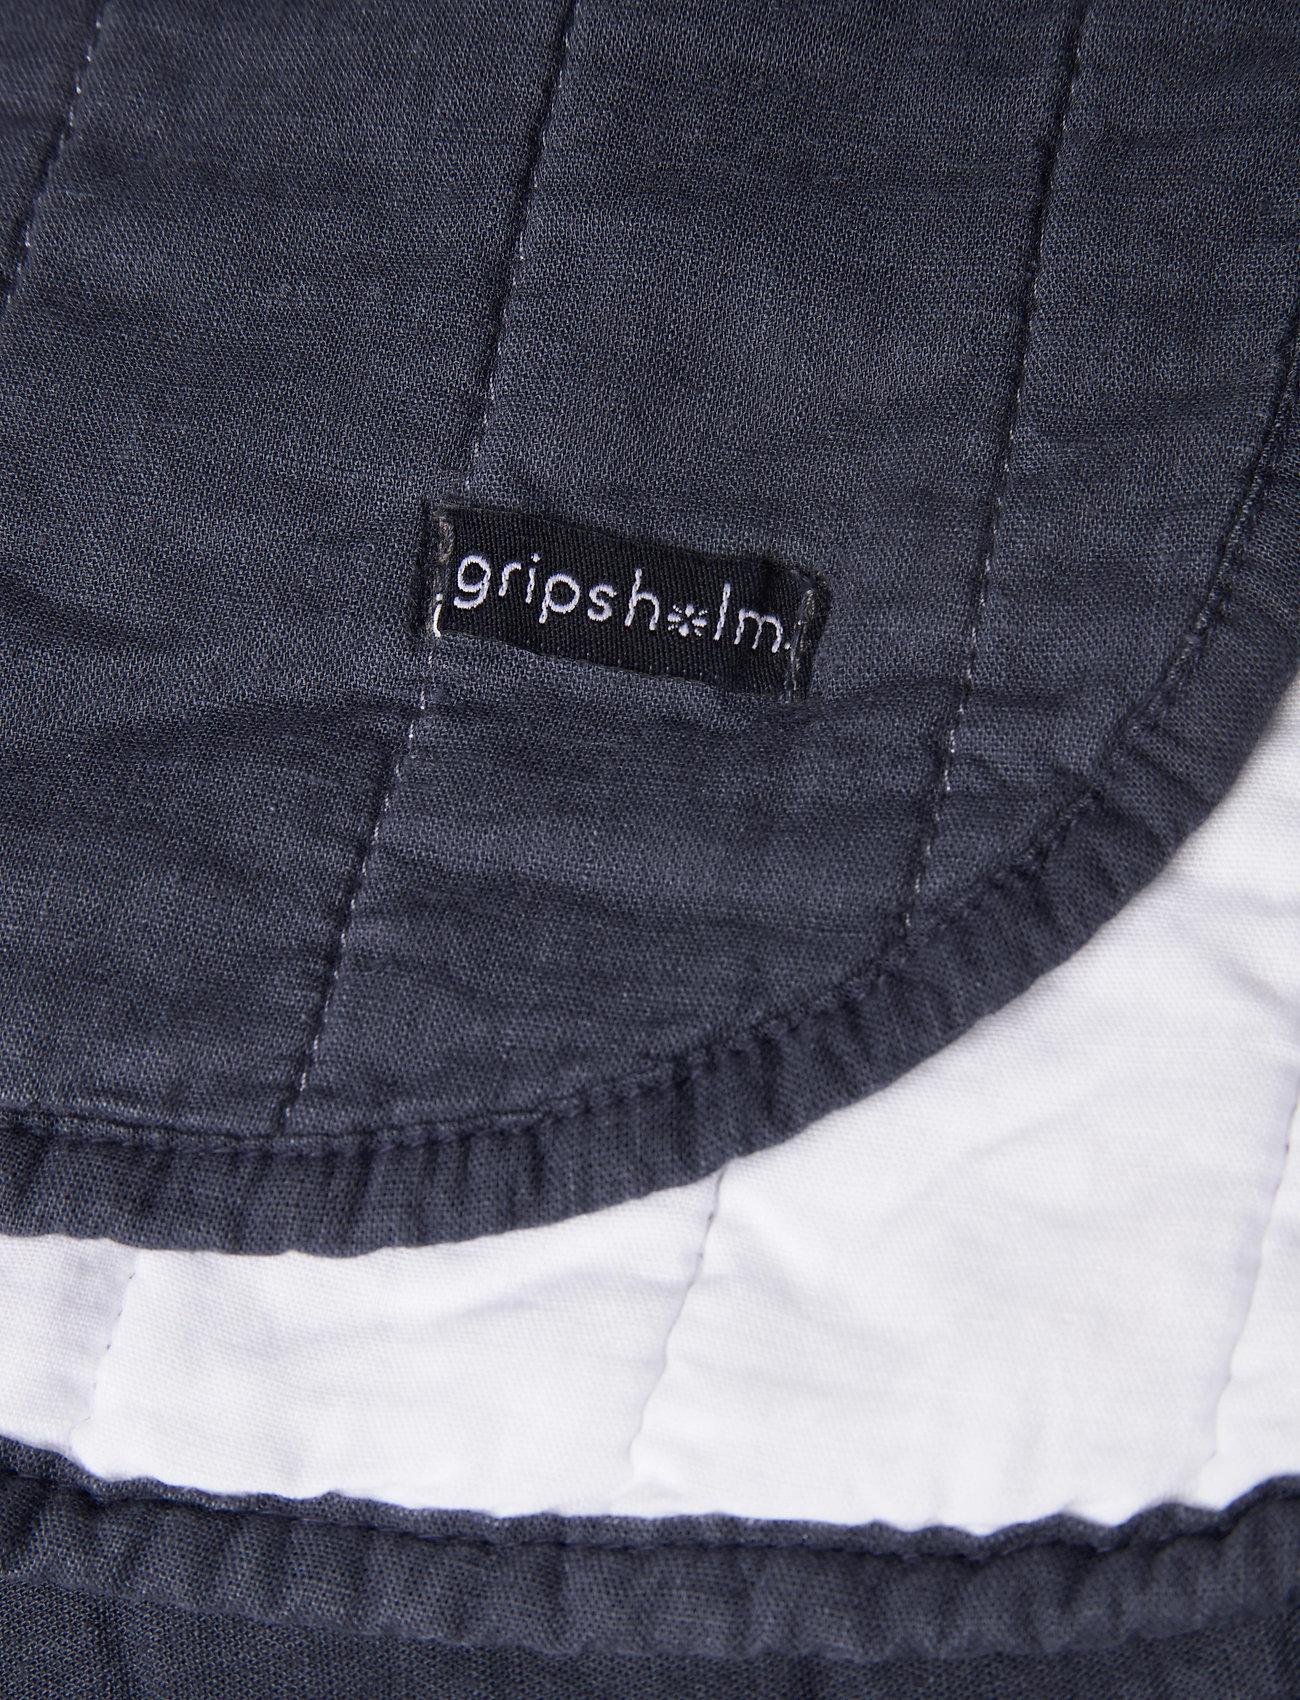 Gripsholm BEDSPREAD LINEN BLEND K.SIZE - Salon OMBRE BLUE - Akcesoria